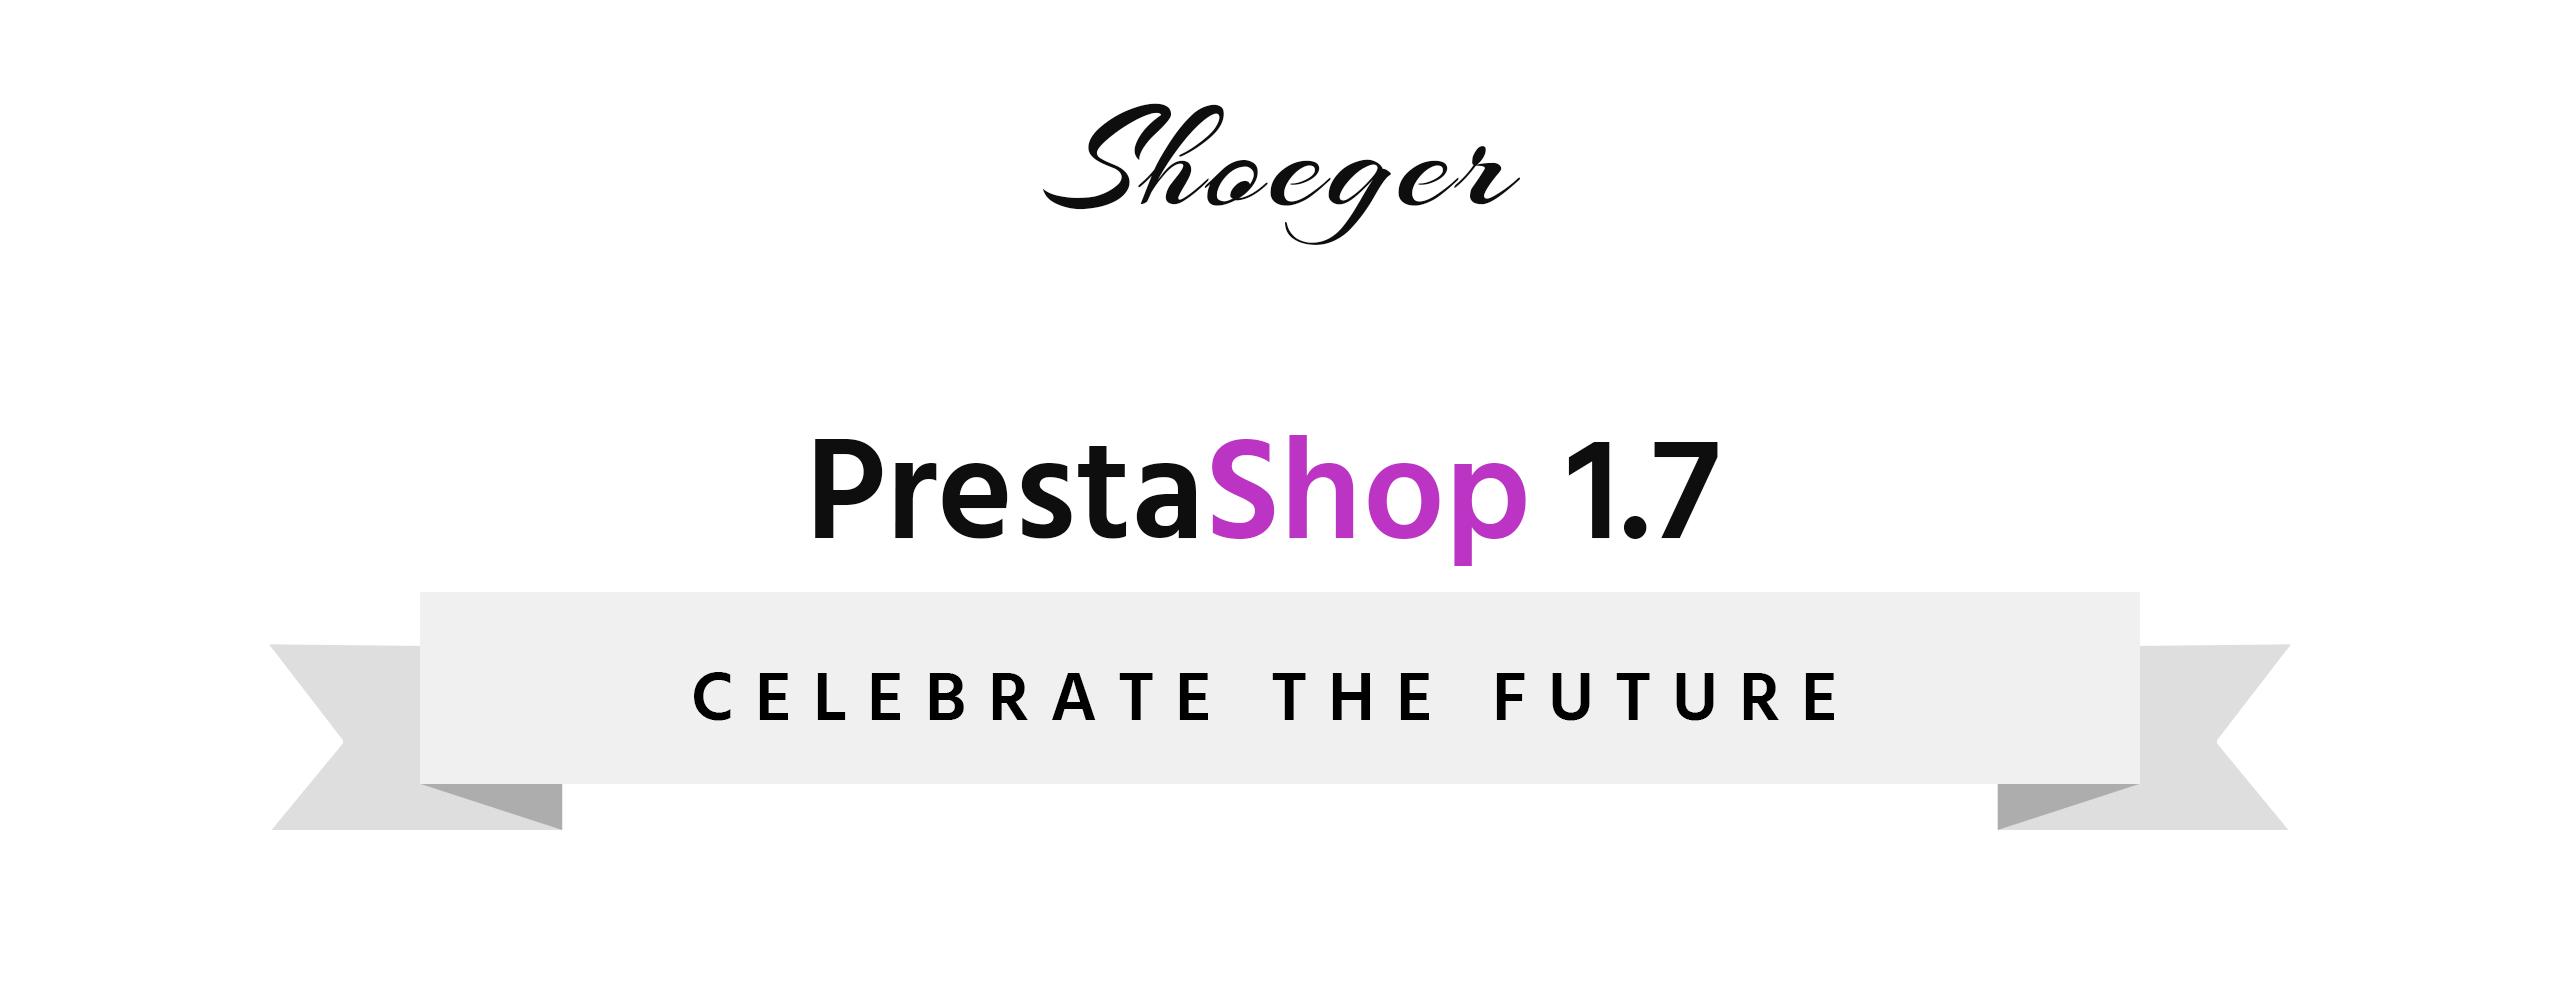 Shoeger PrestaShop Theme